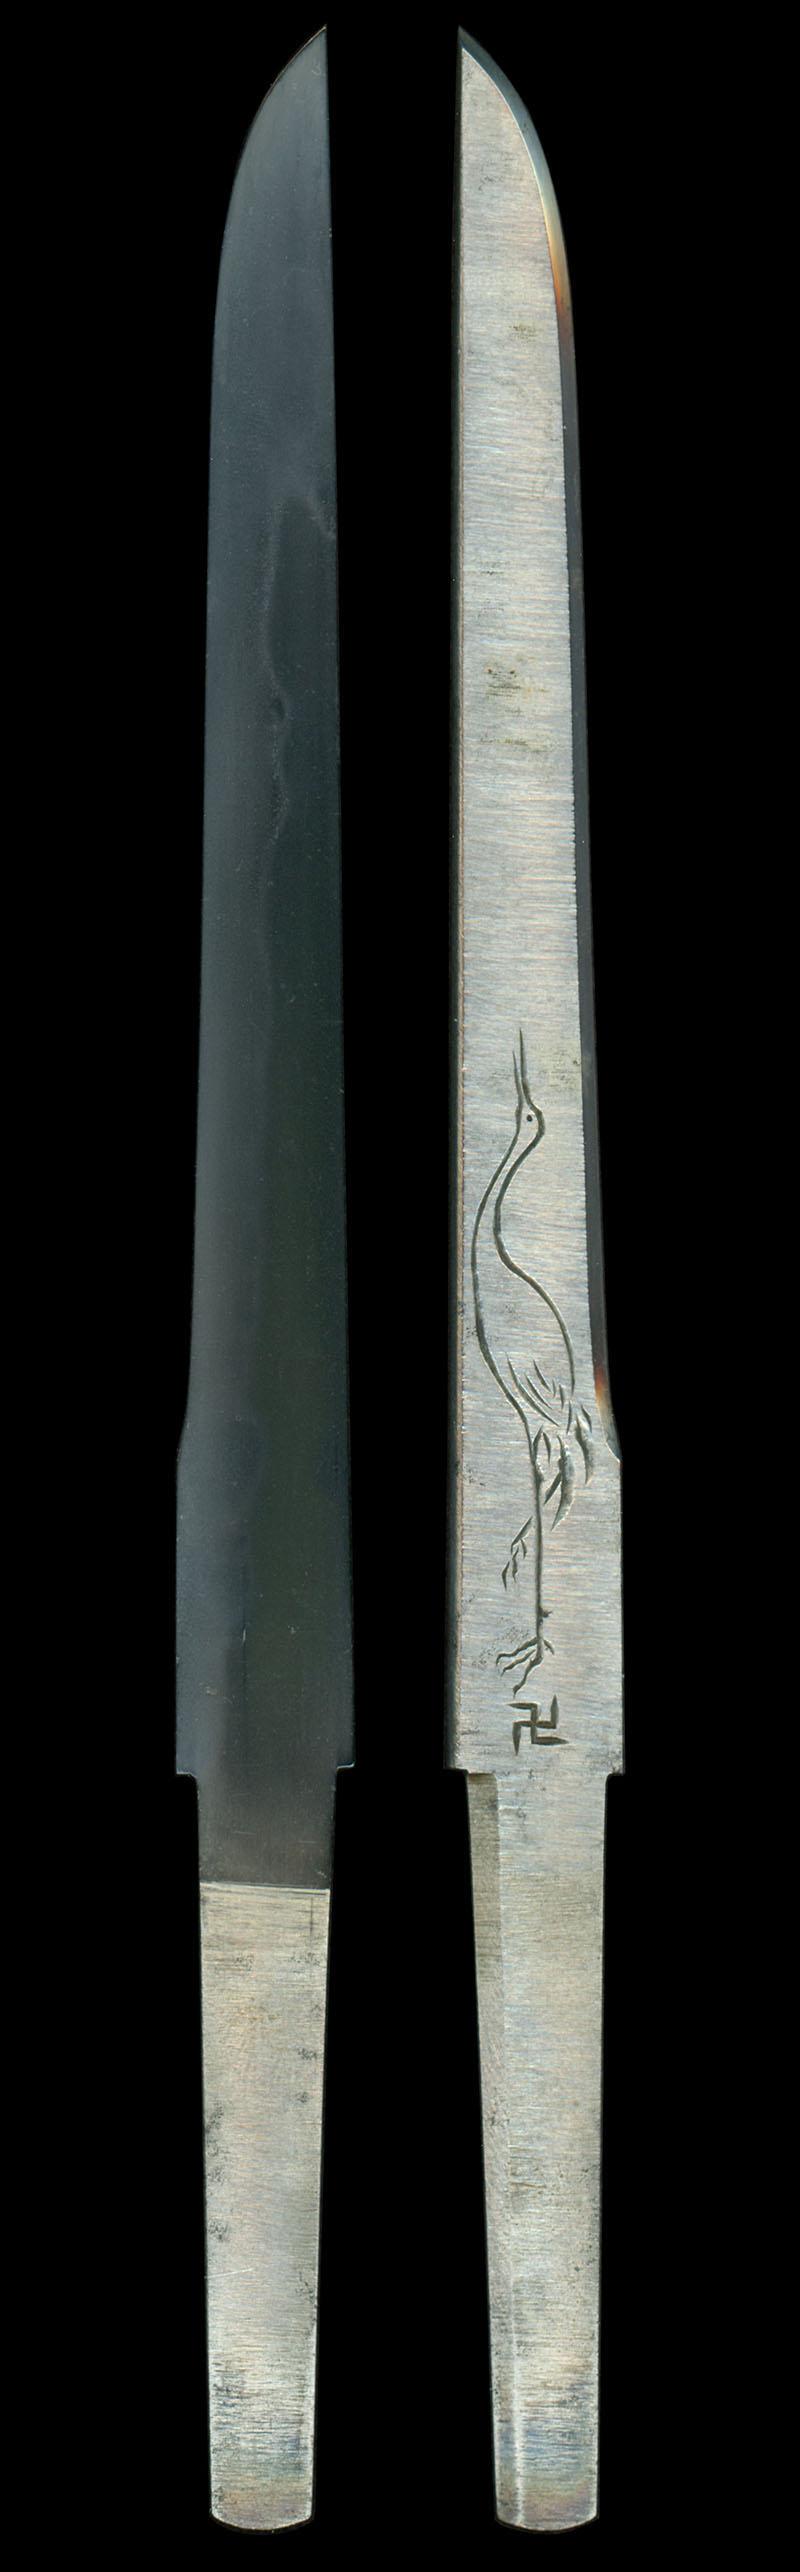 卍(桜井正次)Picture of whole